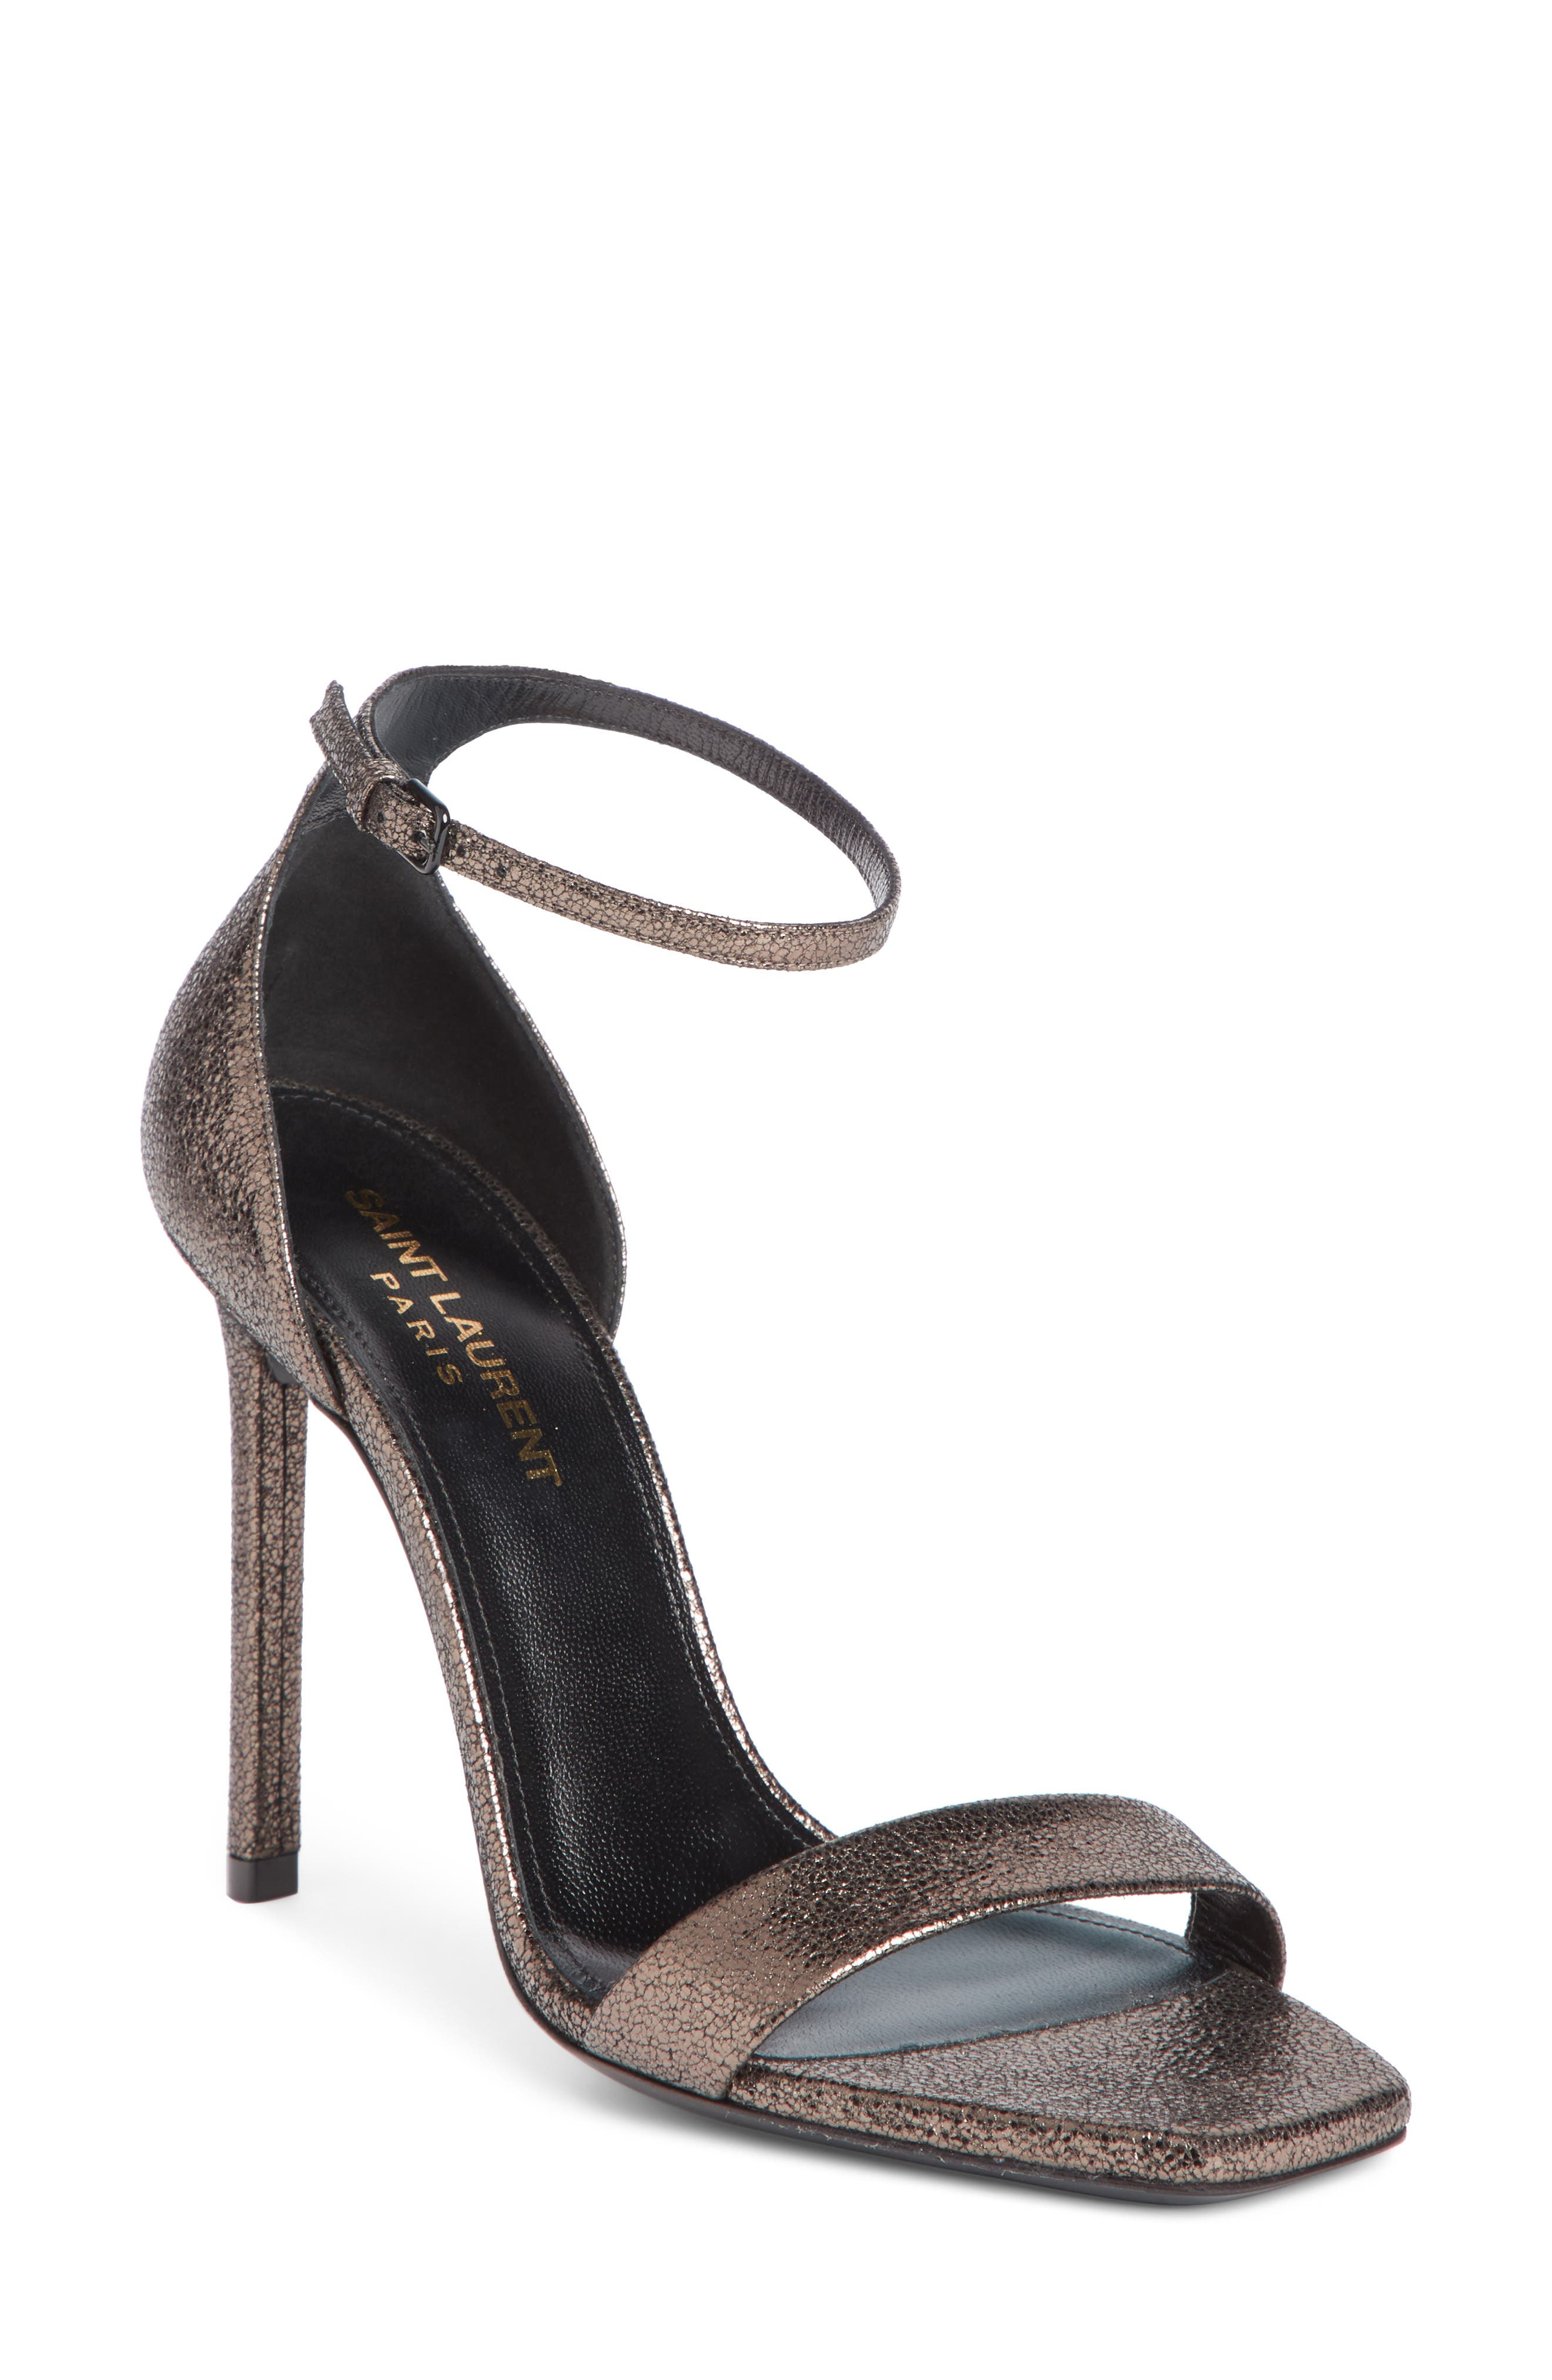 3b57020a772c Saint Laurent Amber Ankle Strap Sandal